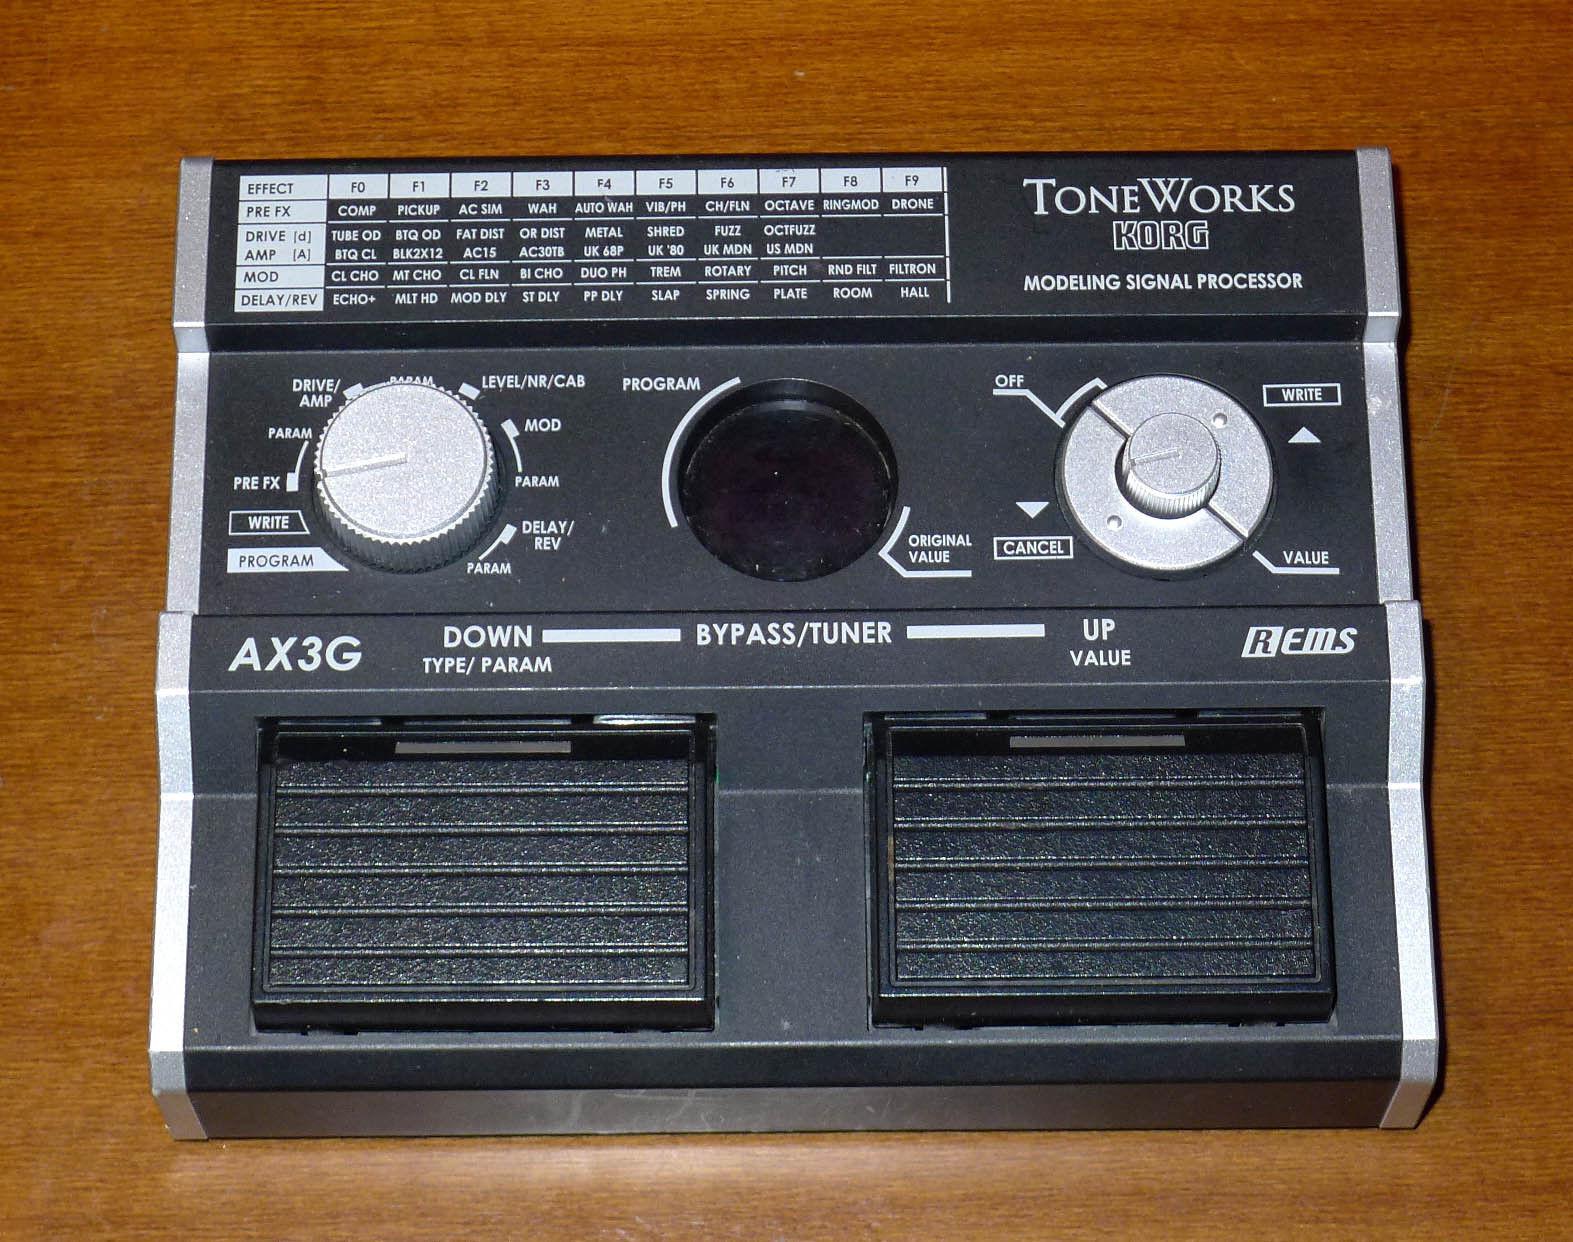 Korg toneworks AX3G multi effects pedal modeling amp delay reverb for guitar